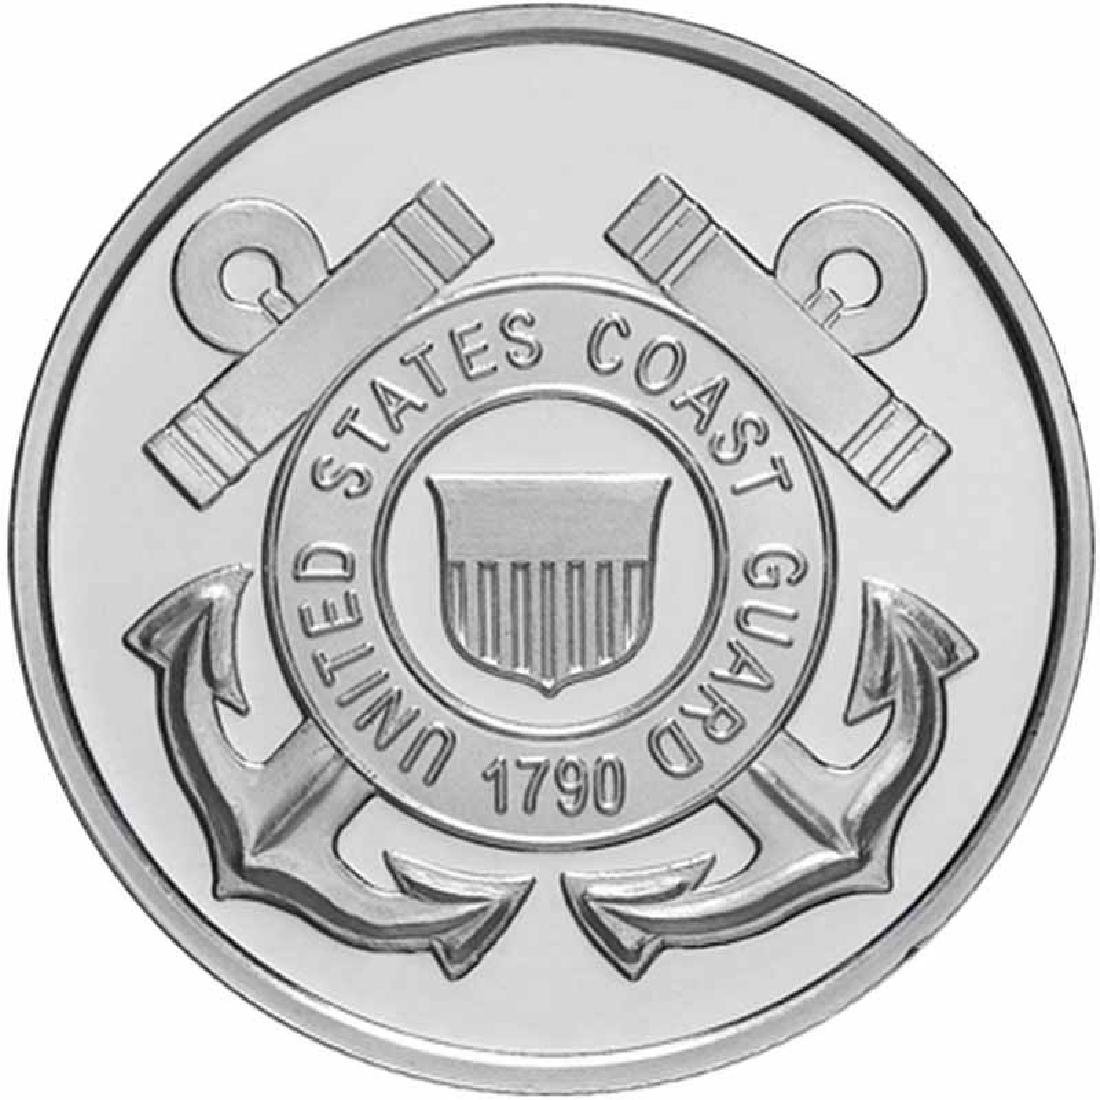 US Coast Guard .999 Silver 1 oz Round